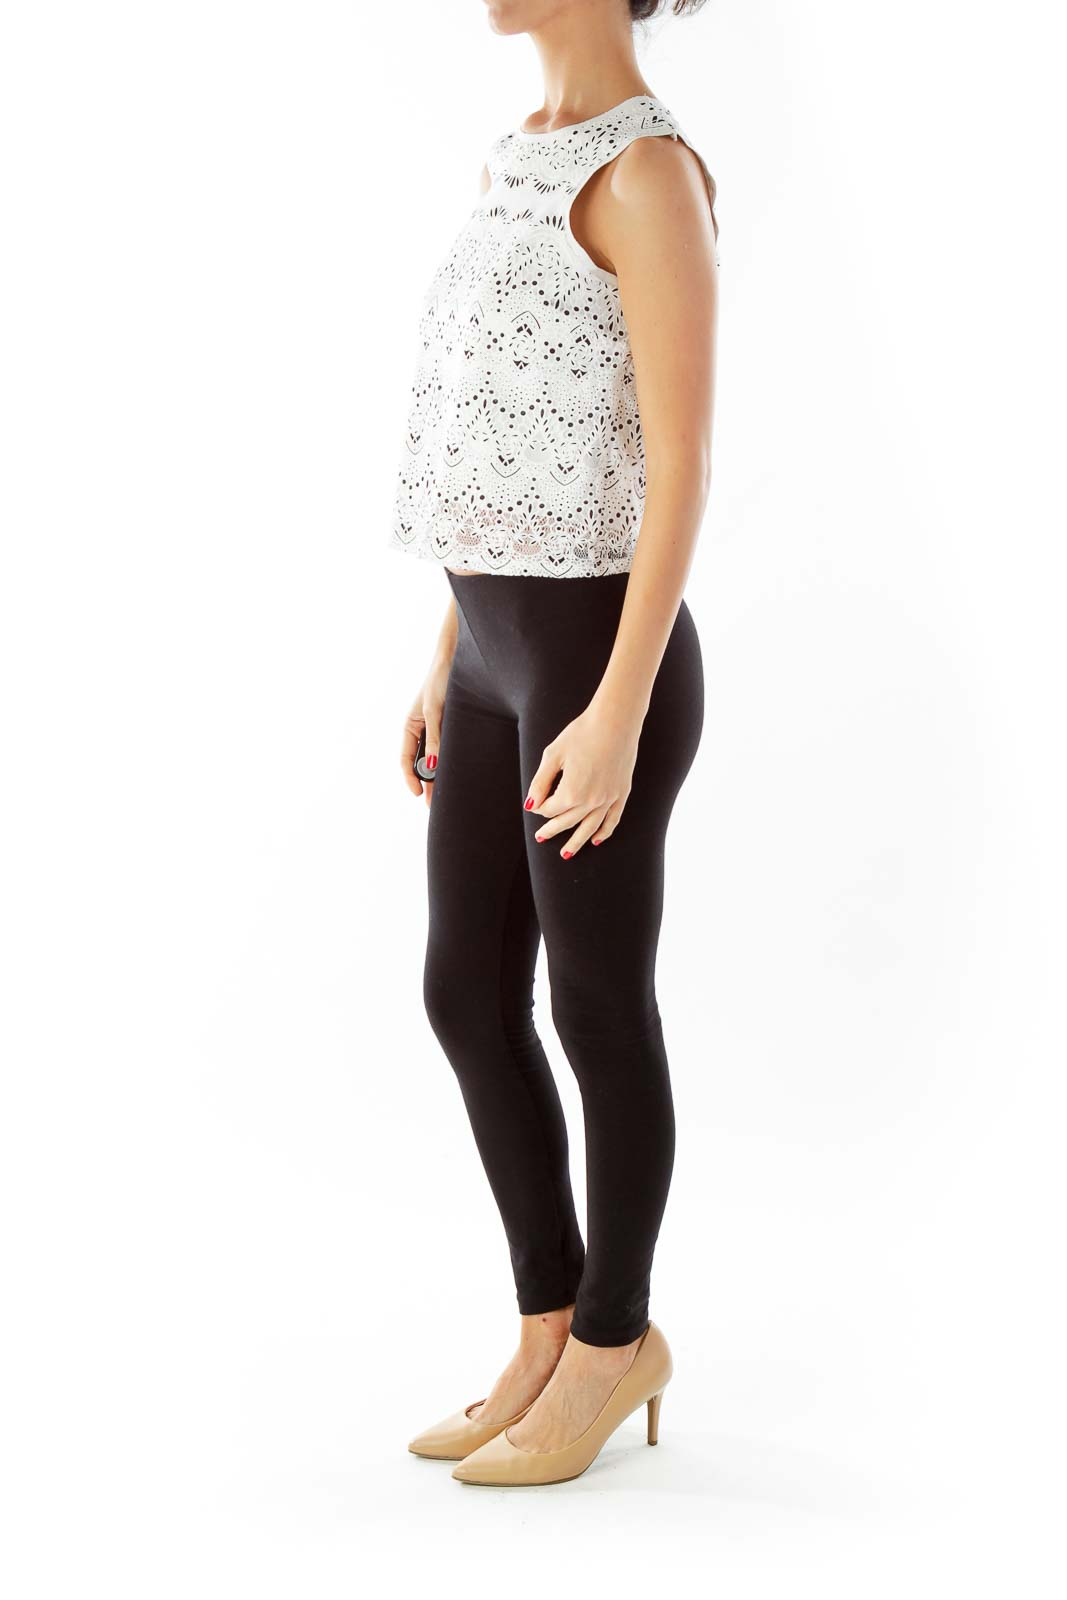 White Black Floral Lace Tank Top